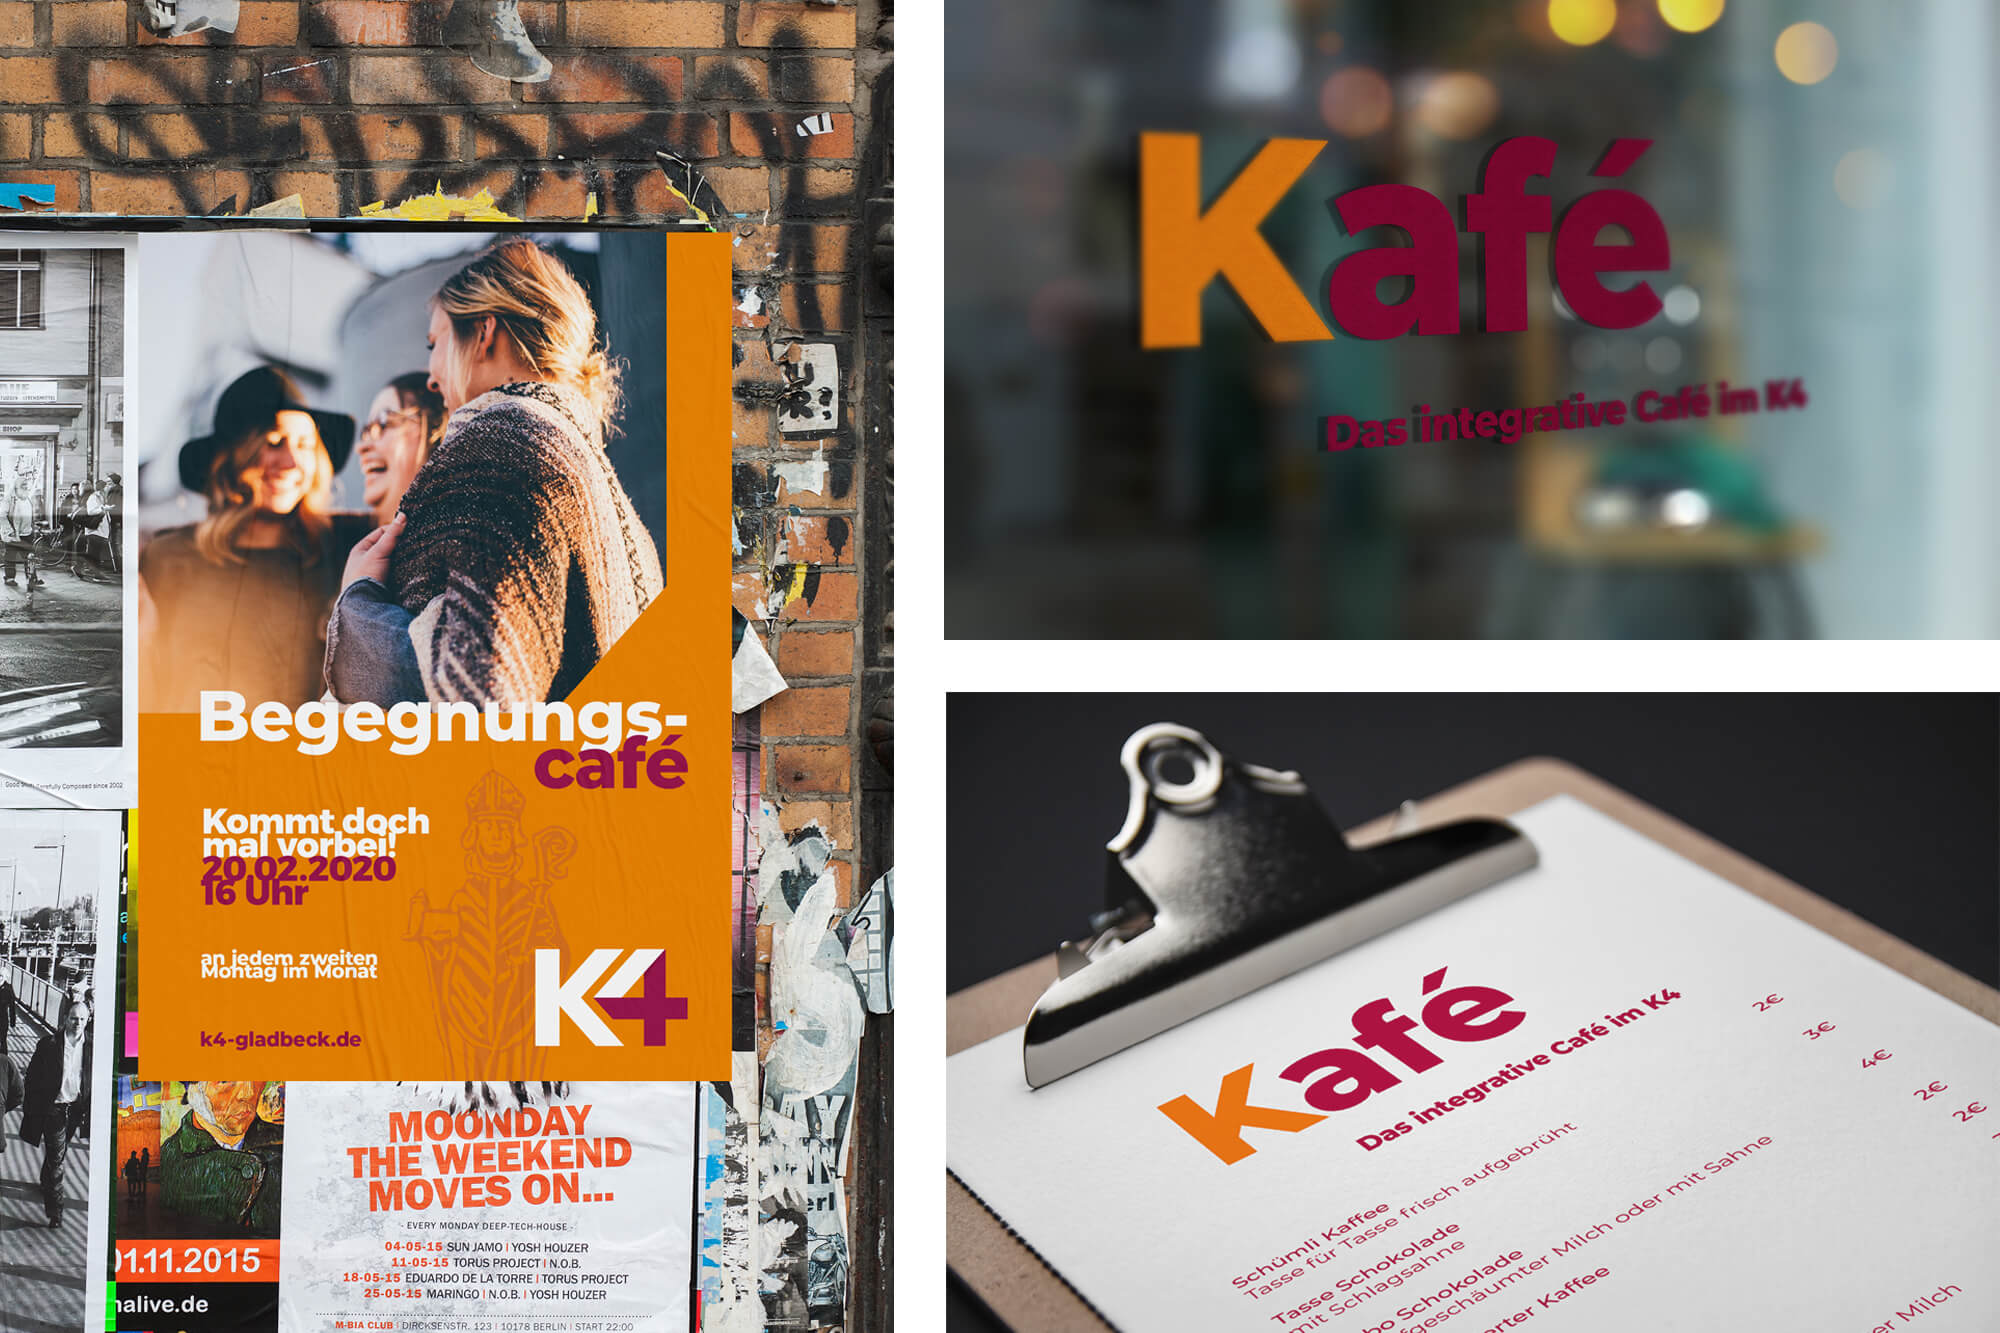 Plakat und Speisekarte für integratives Café KA